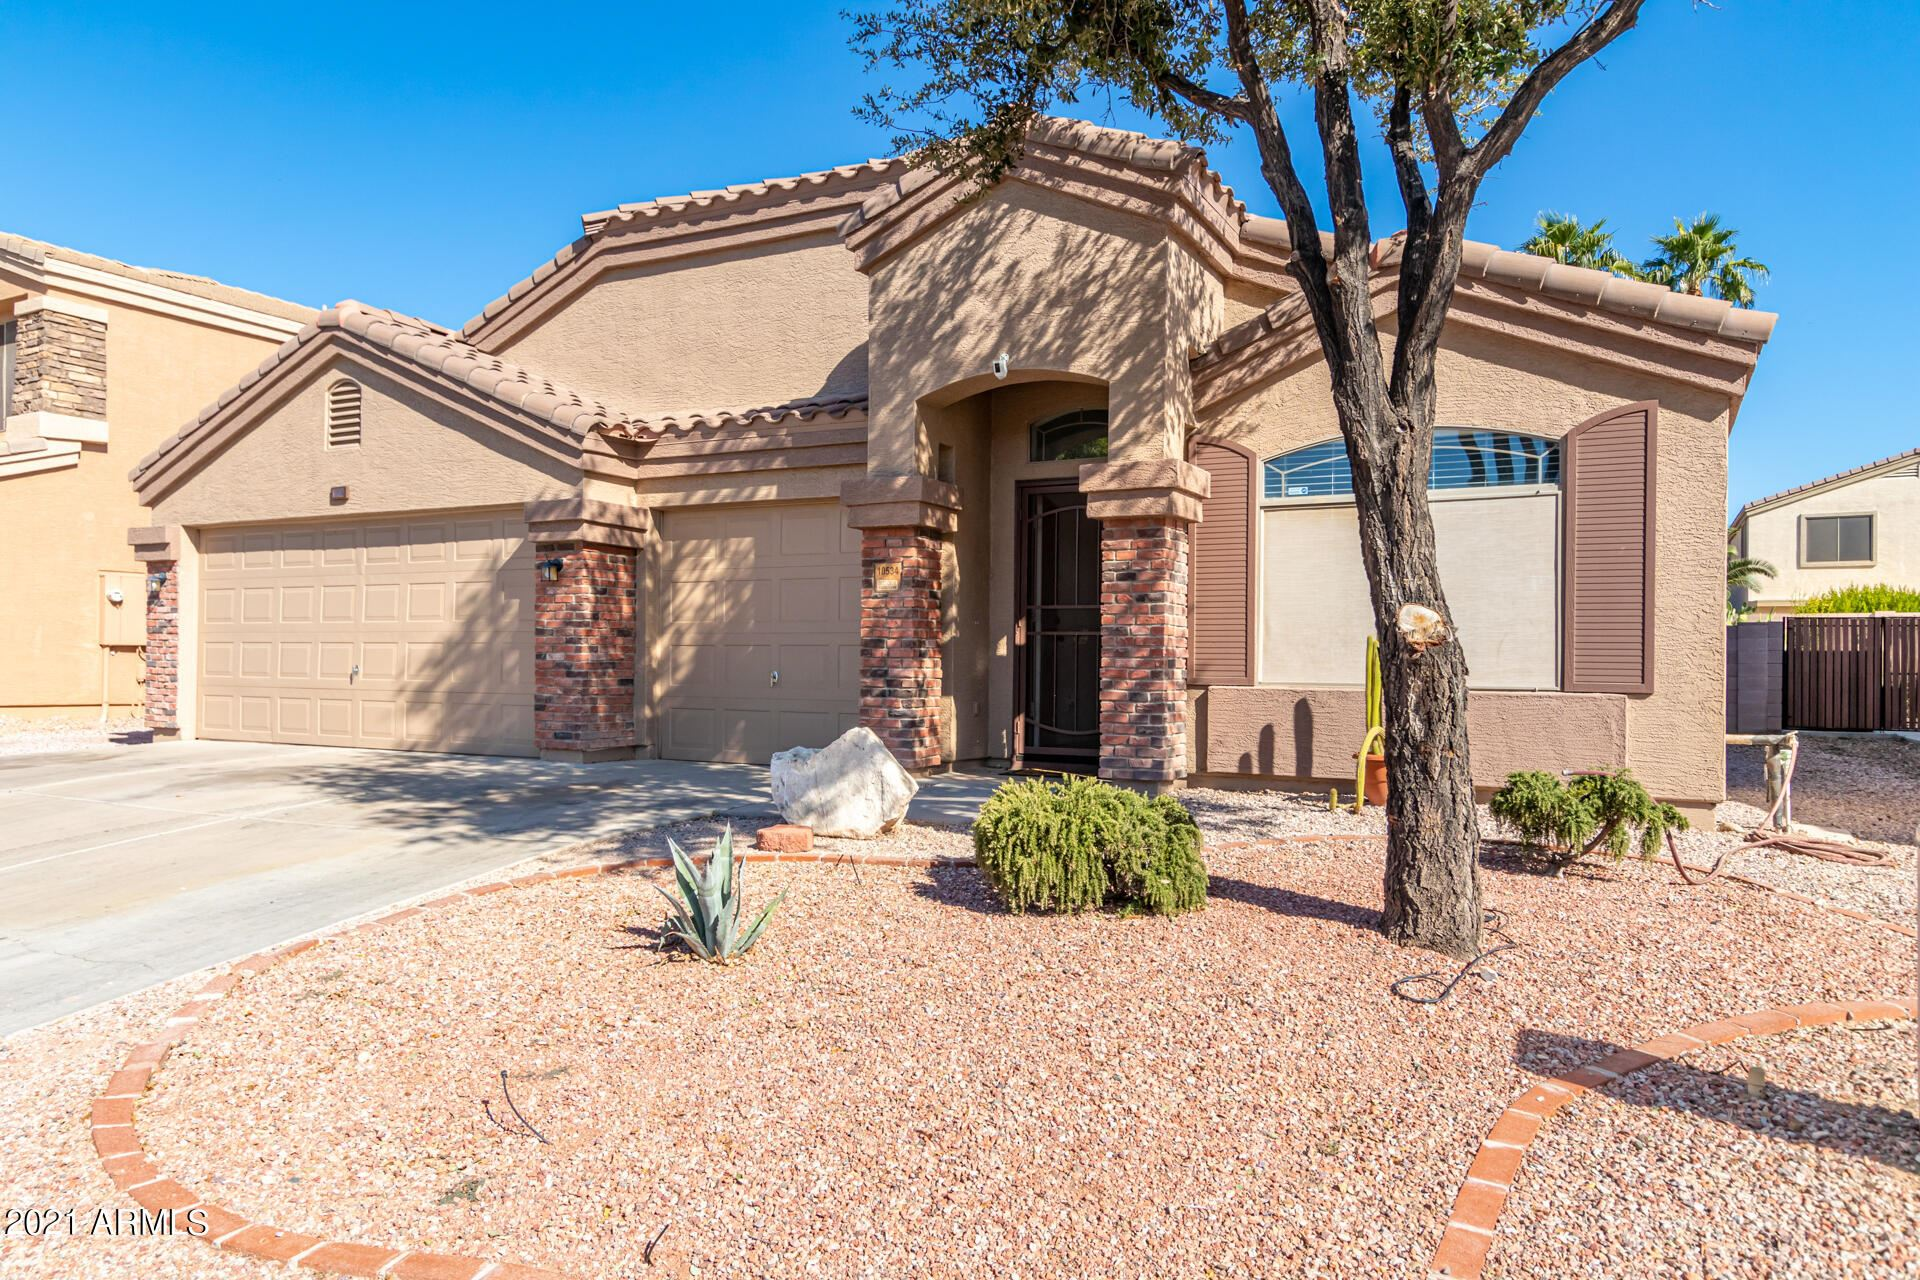 Photo of 10534 W ZAK Road, Tolleson, AZ 85353 (MLS # 6308440)